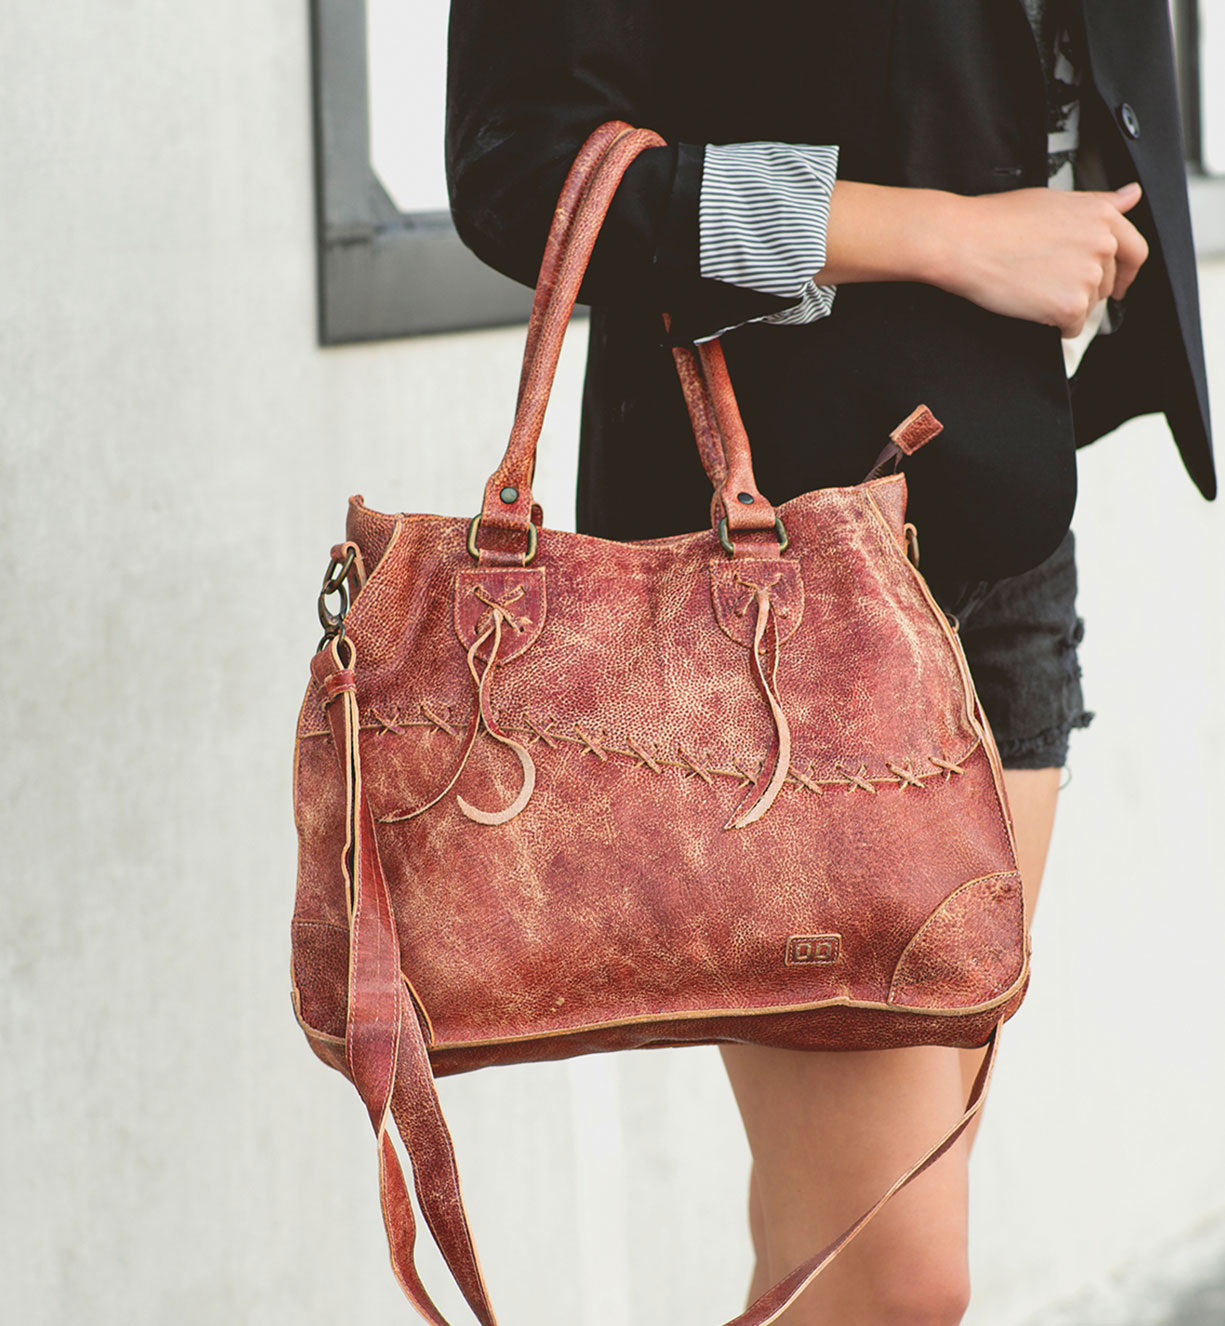 bedstu women's leather bags